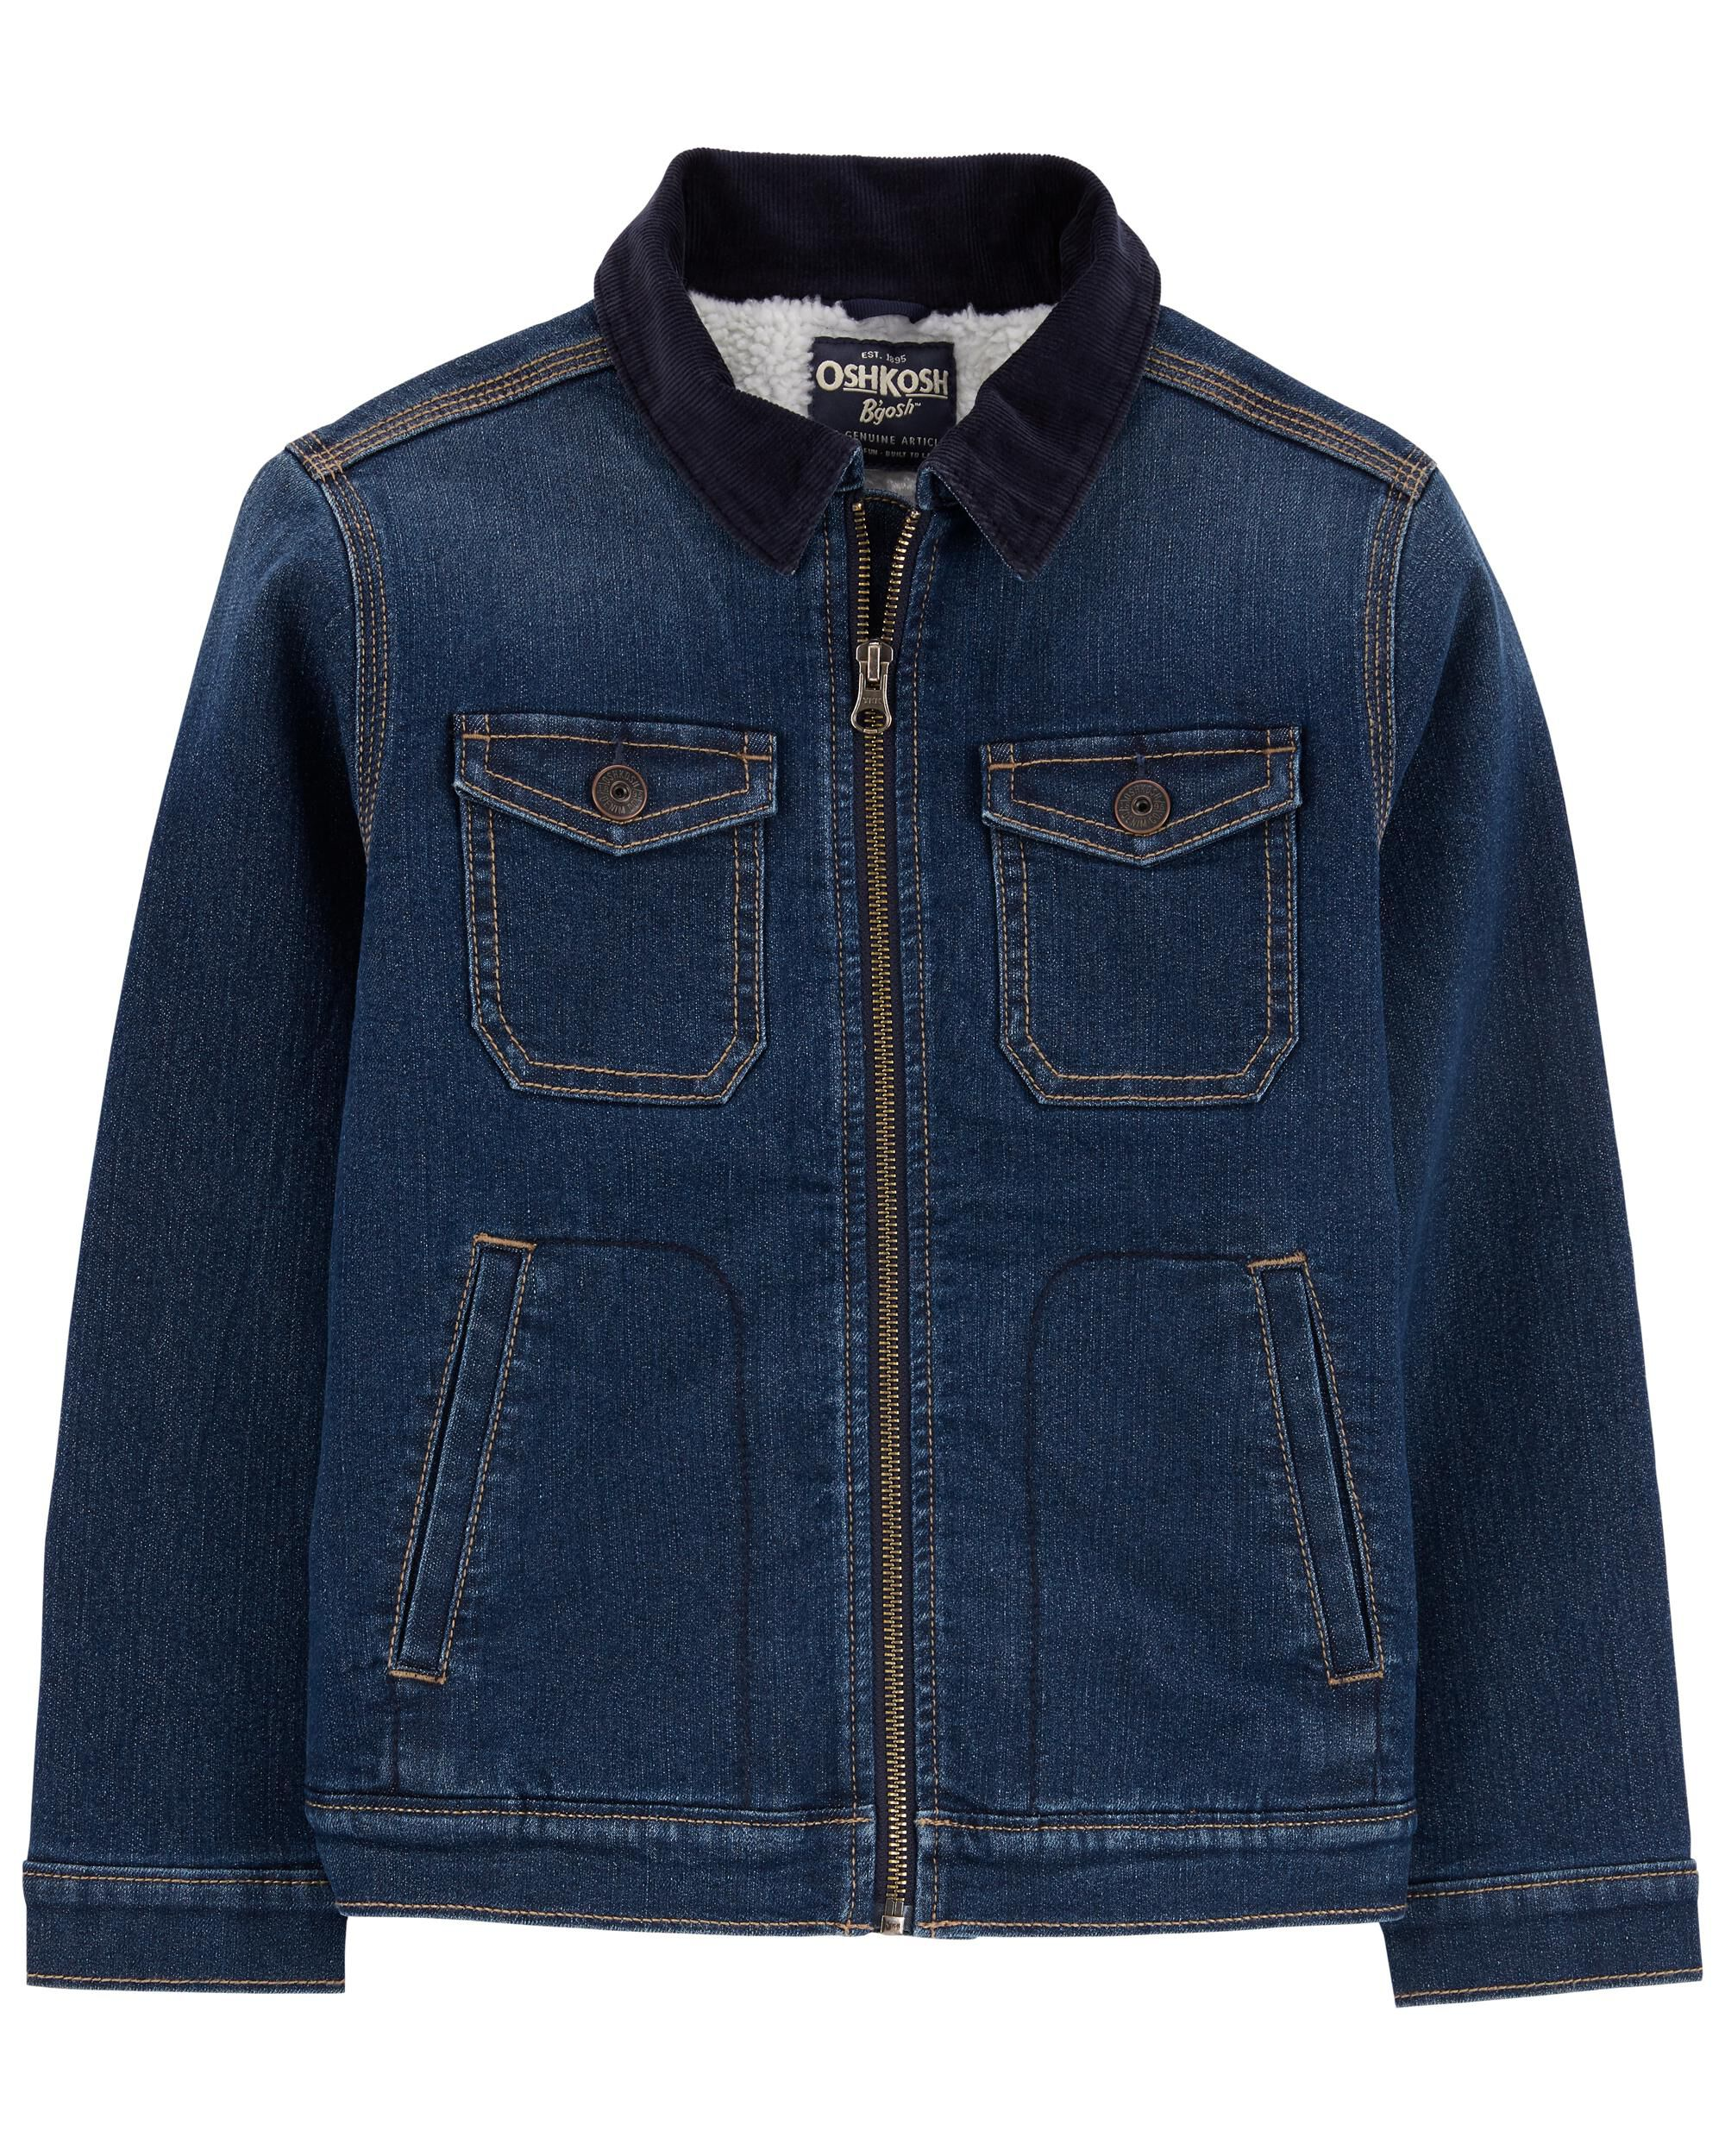 Sherpa-Lined Knit Denim Jacket